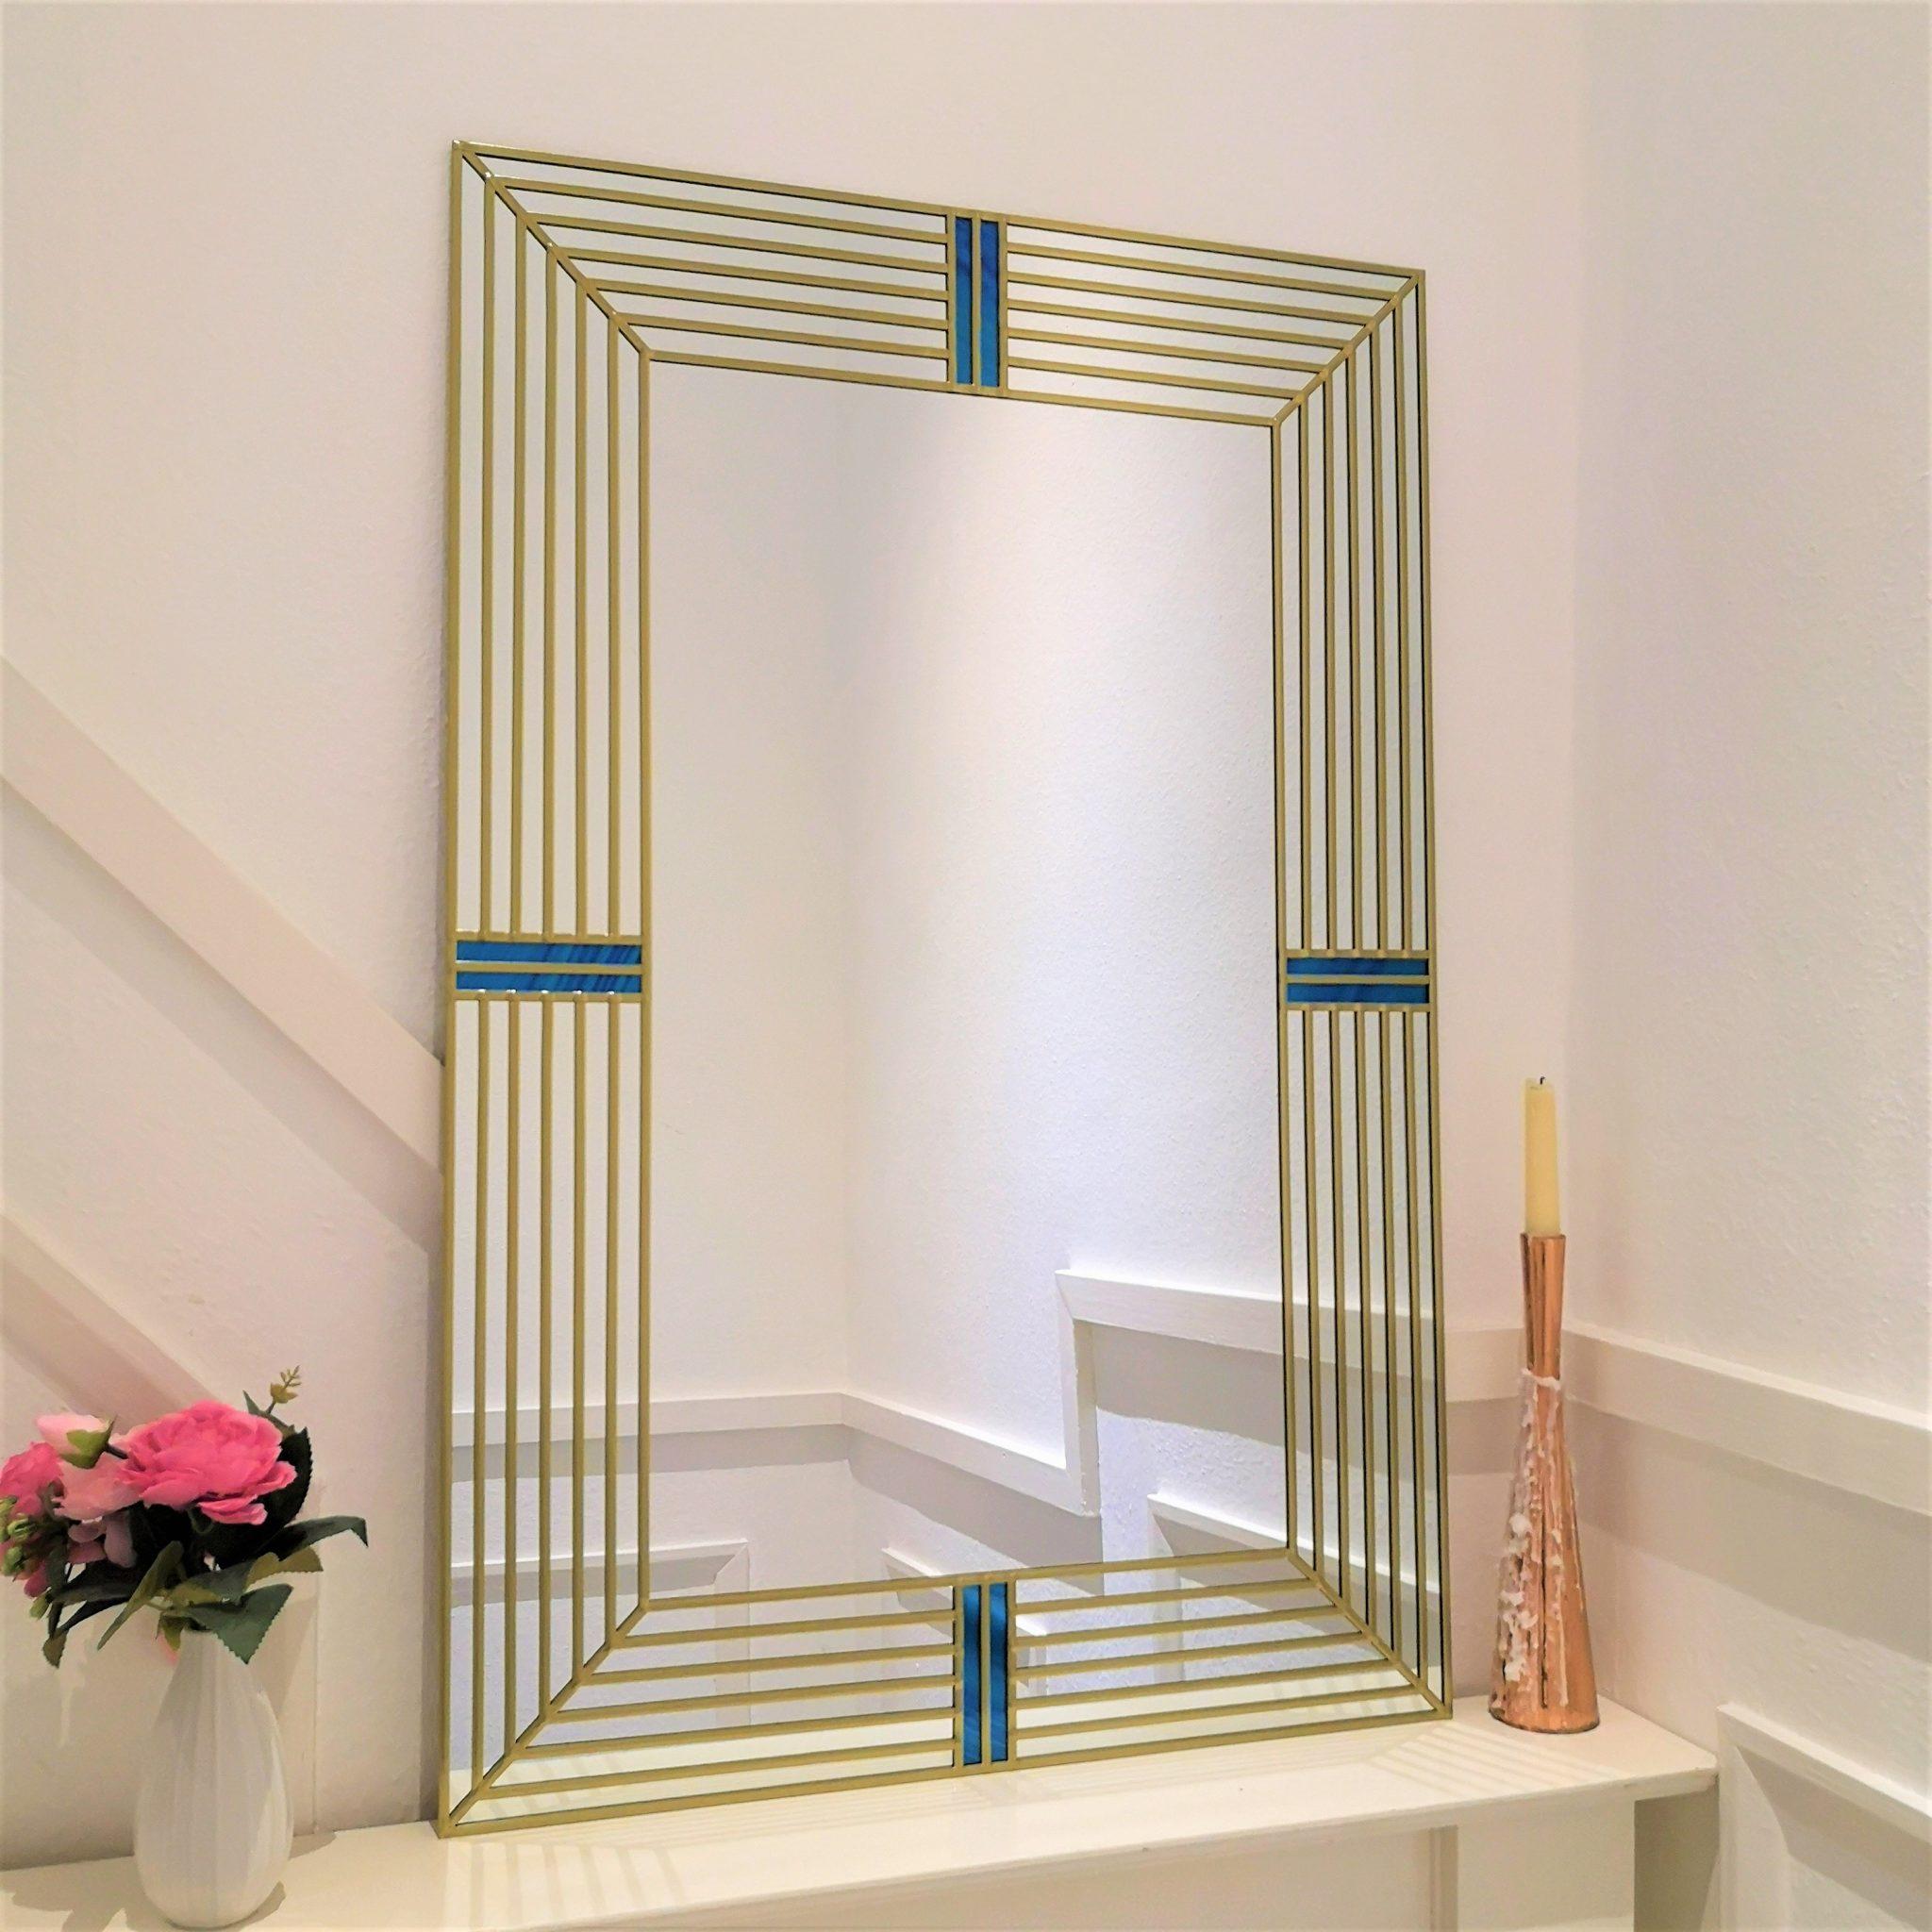 Art Deco Wall Mirror 61x91cm 2ftx3ft Lawson Glassworks